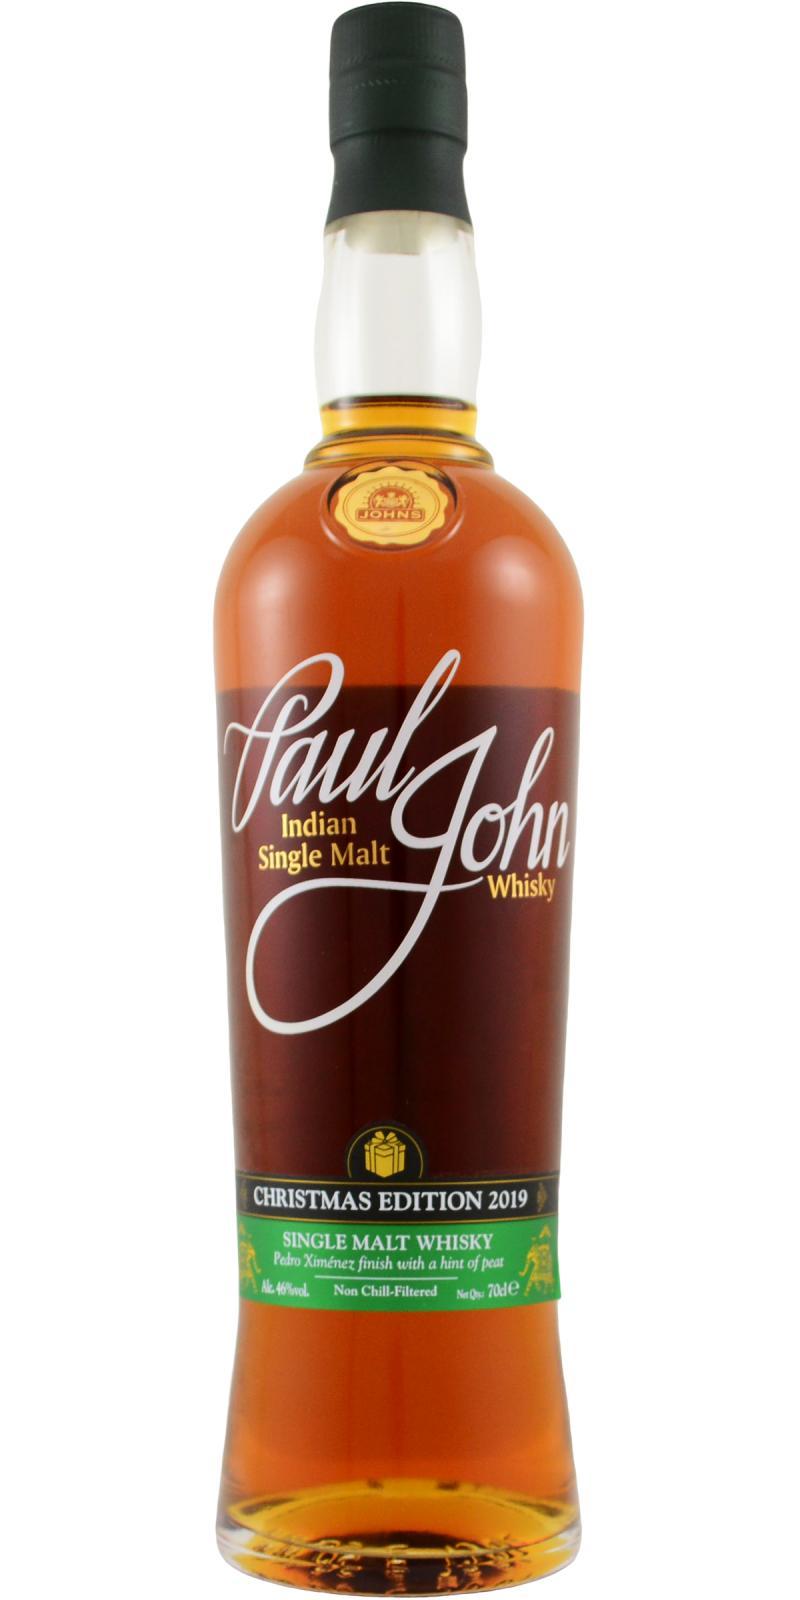 Paul John Christmas Edition 2019